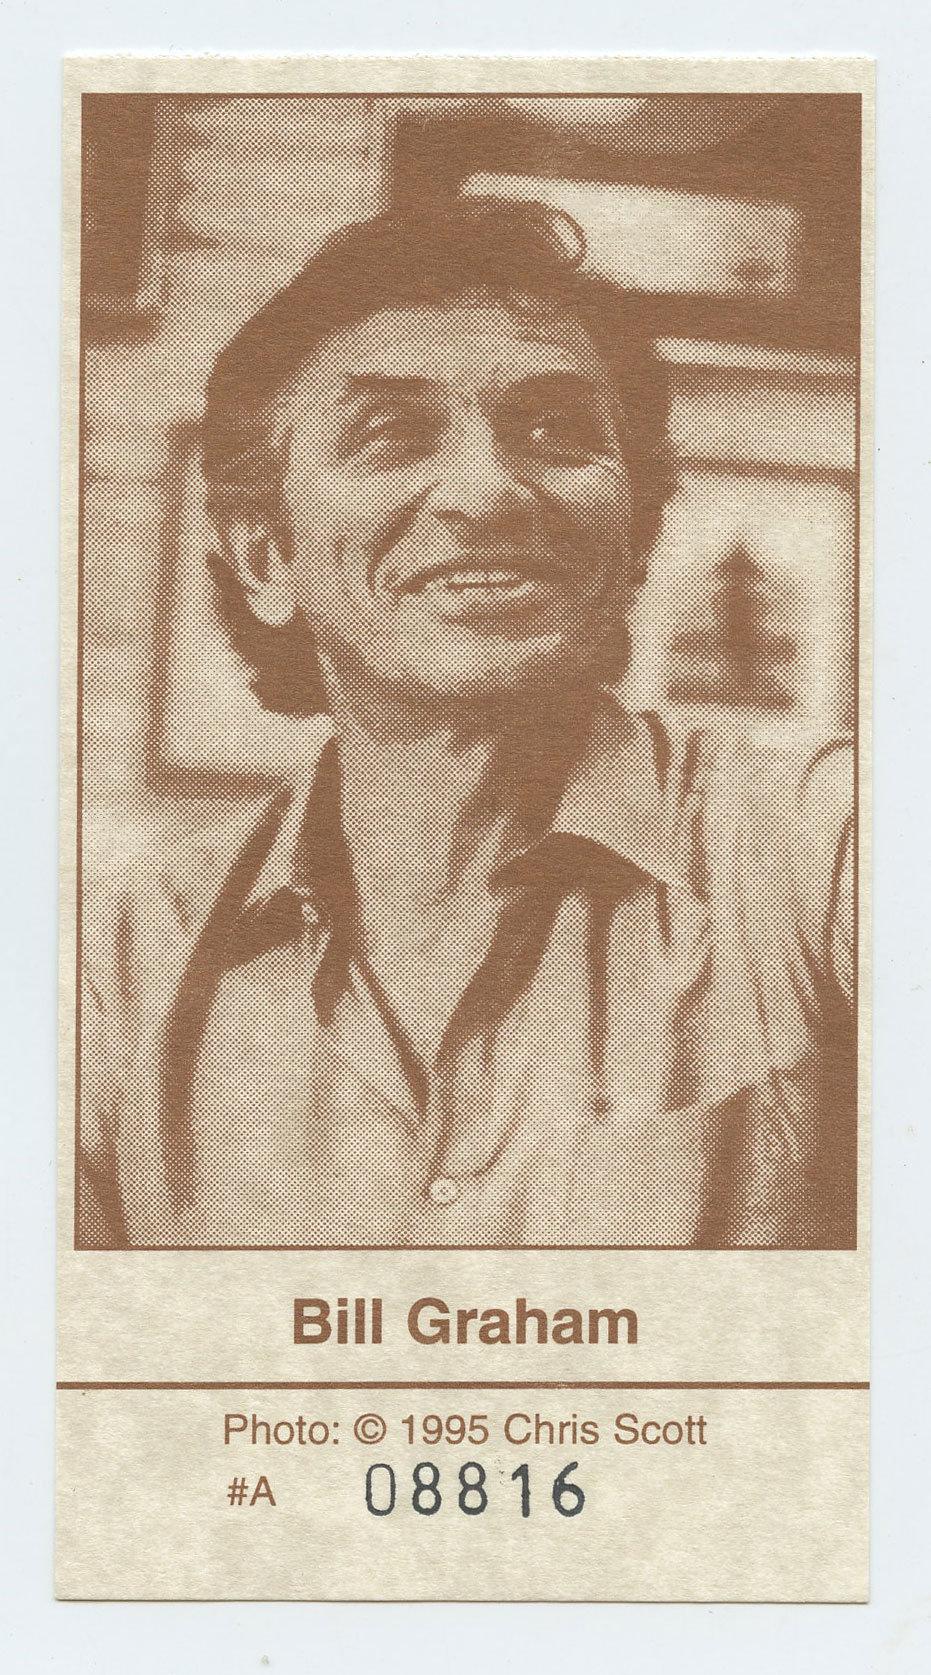 Bill Graham Memorial Ticket 1991 Nov 3 Laughter Love & Music Golden Gate Park